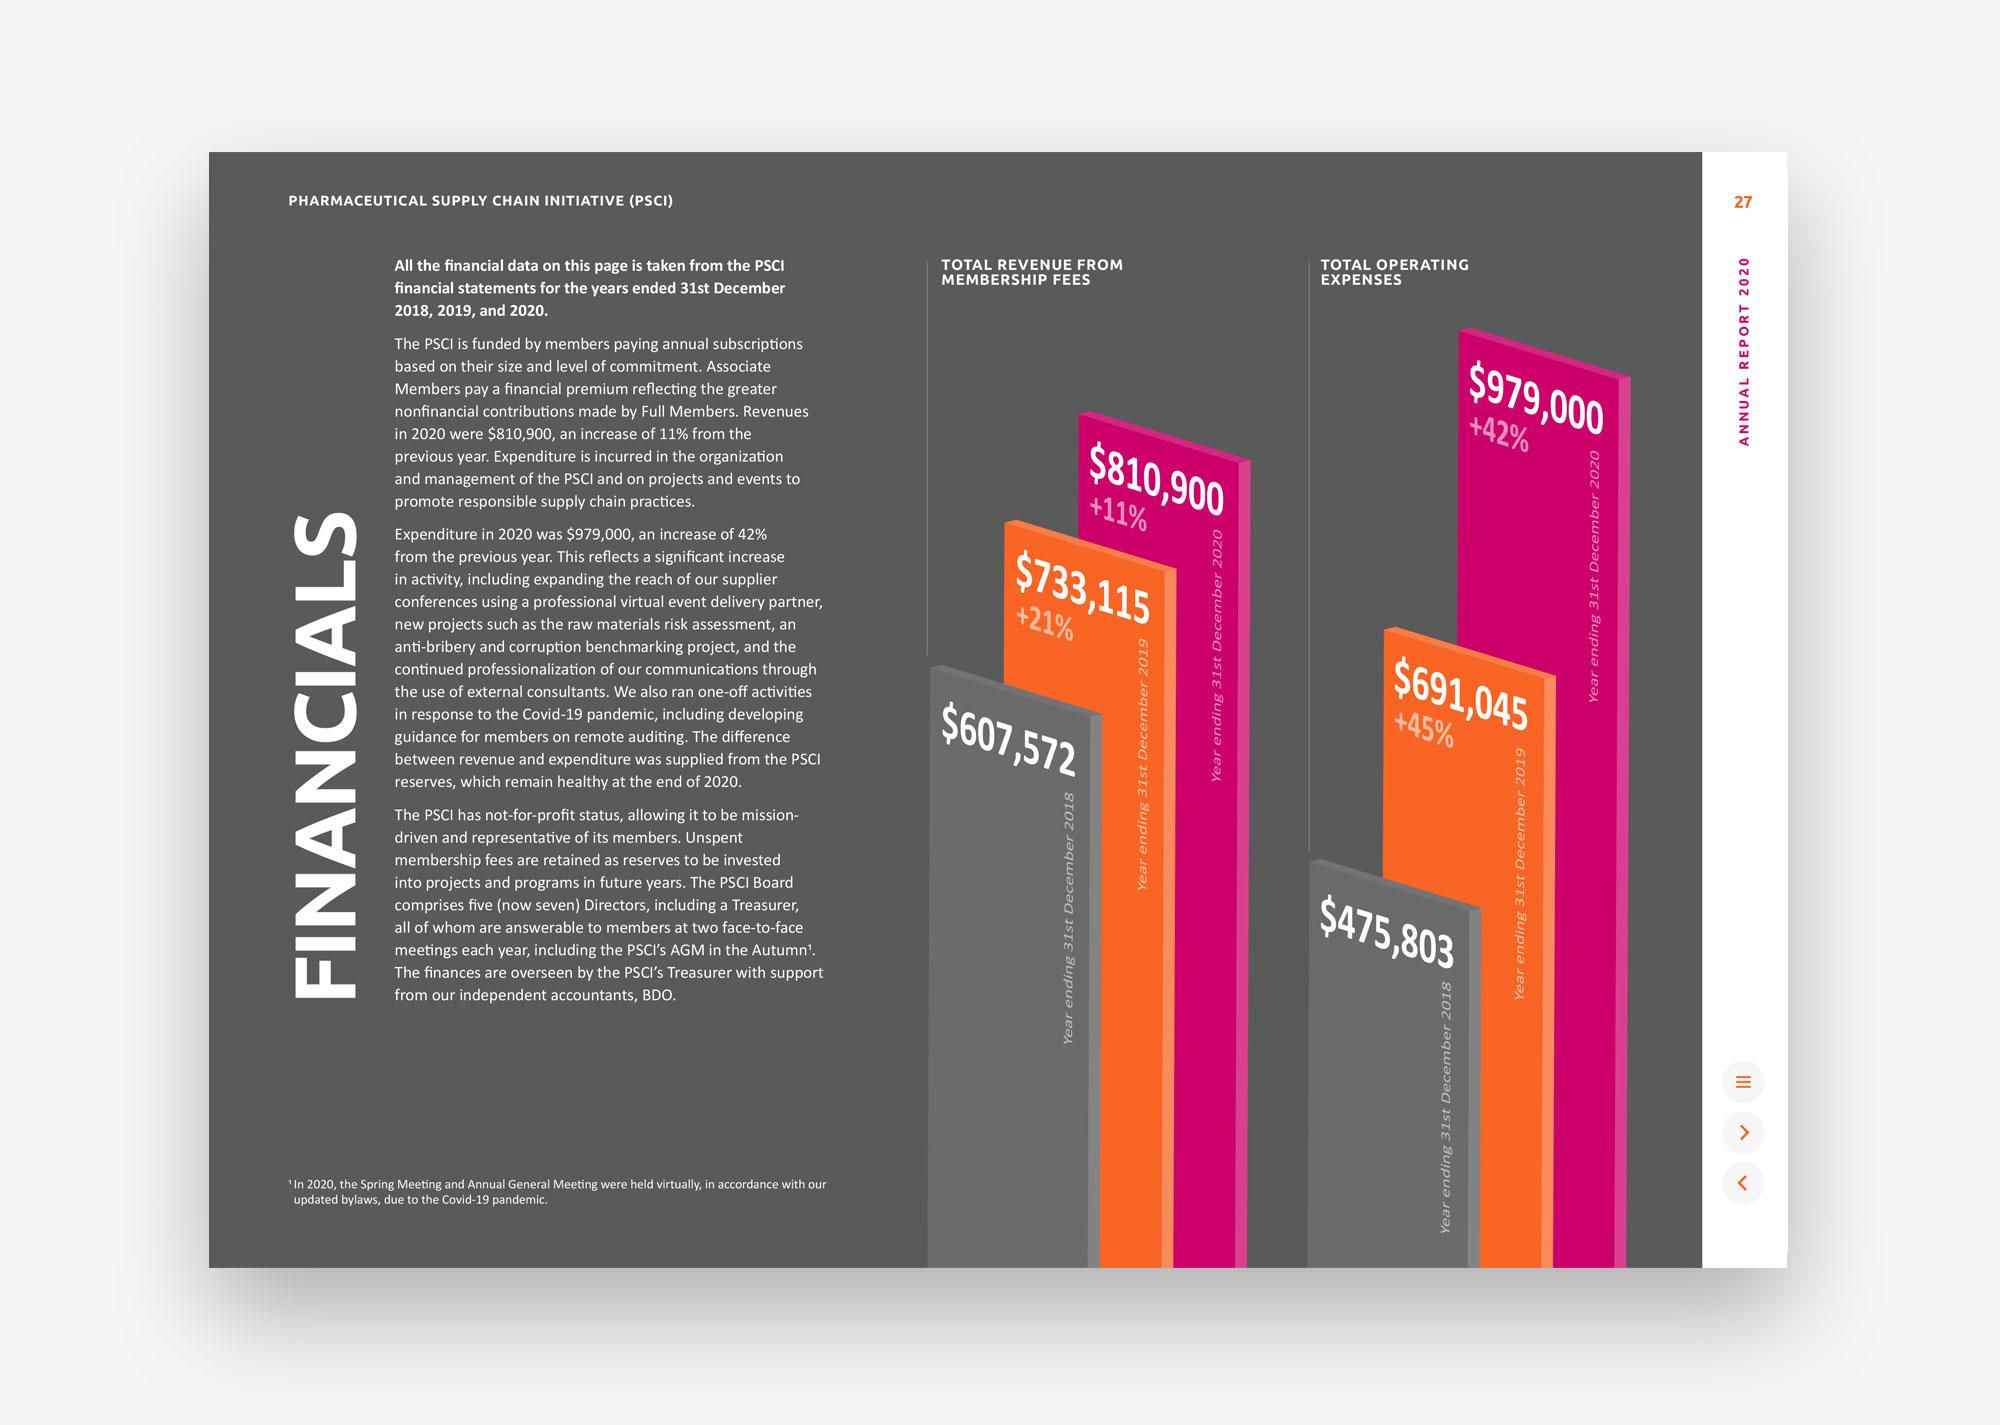 PSCI Annual Report 2020 financials